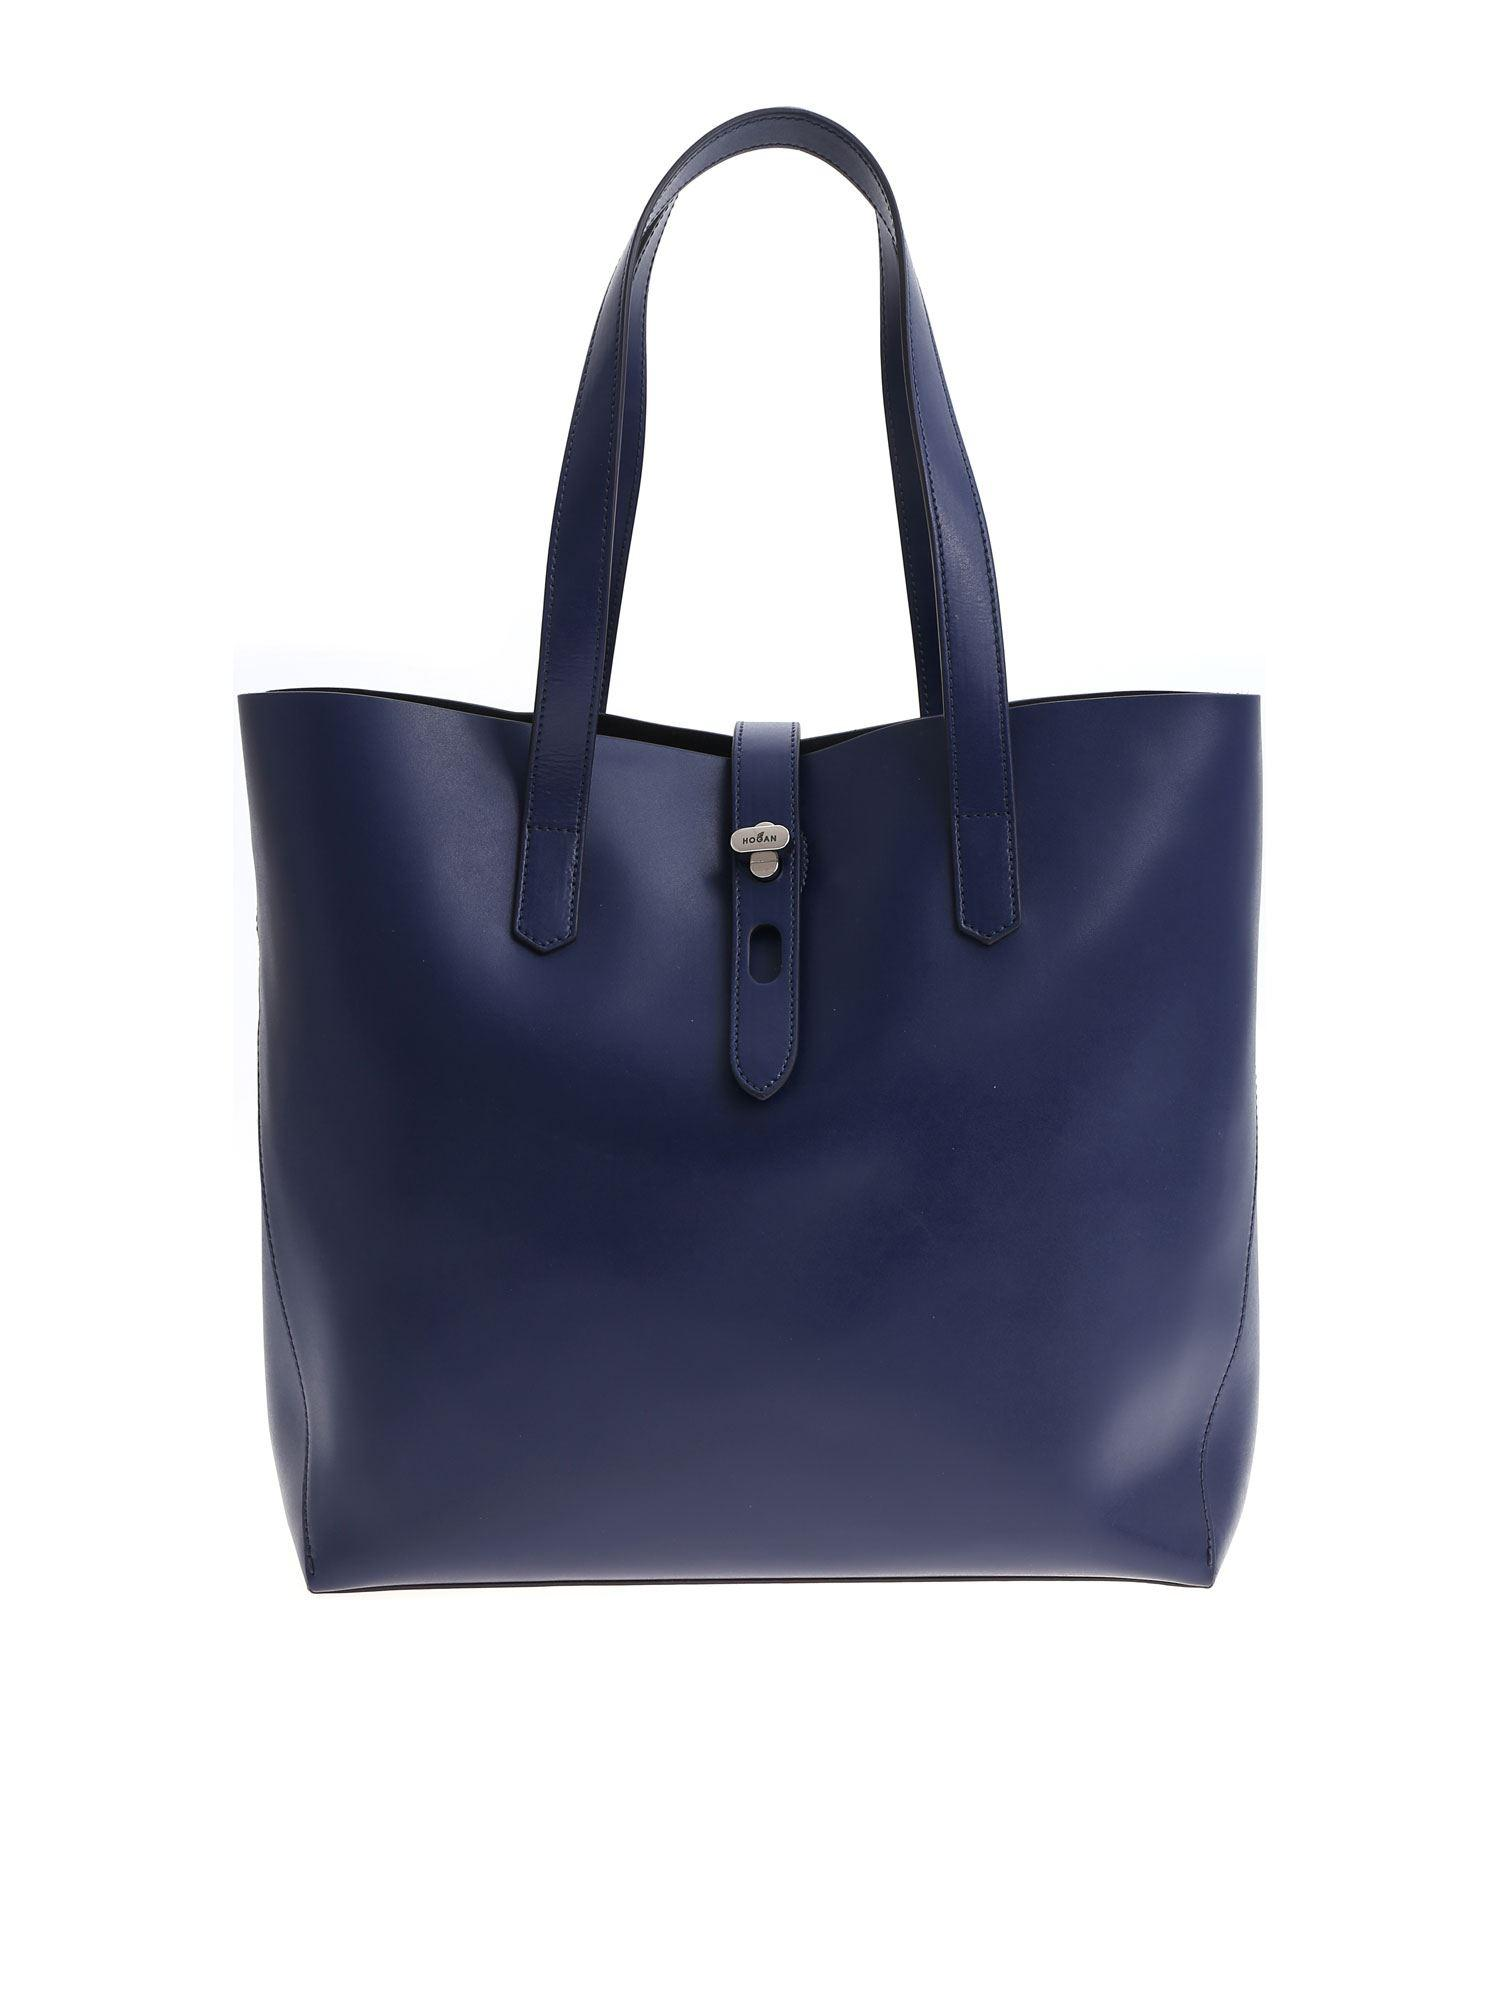 22c1c50eb6 Hogan - Dark Blue Shoulder Bag - Lyst. View fullscreen